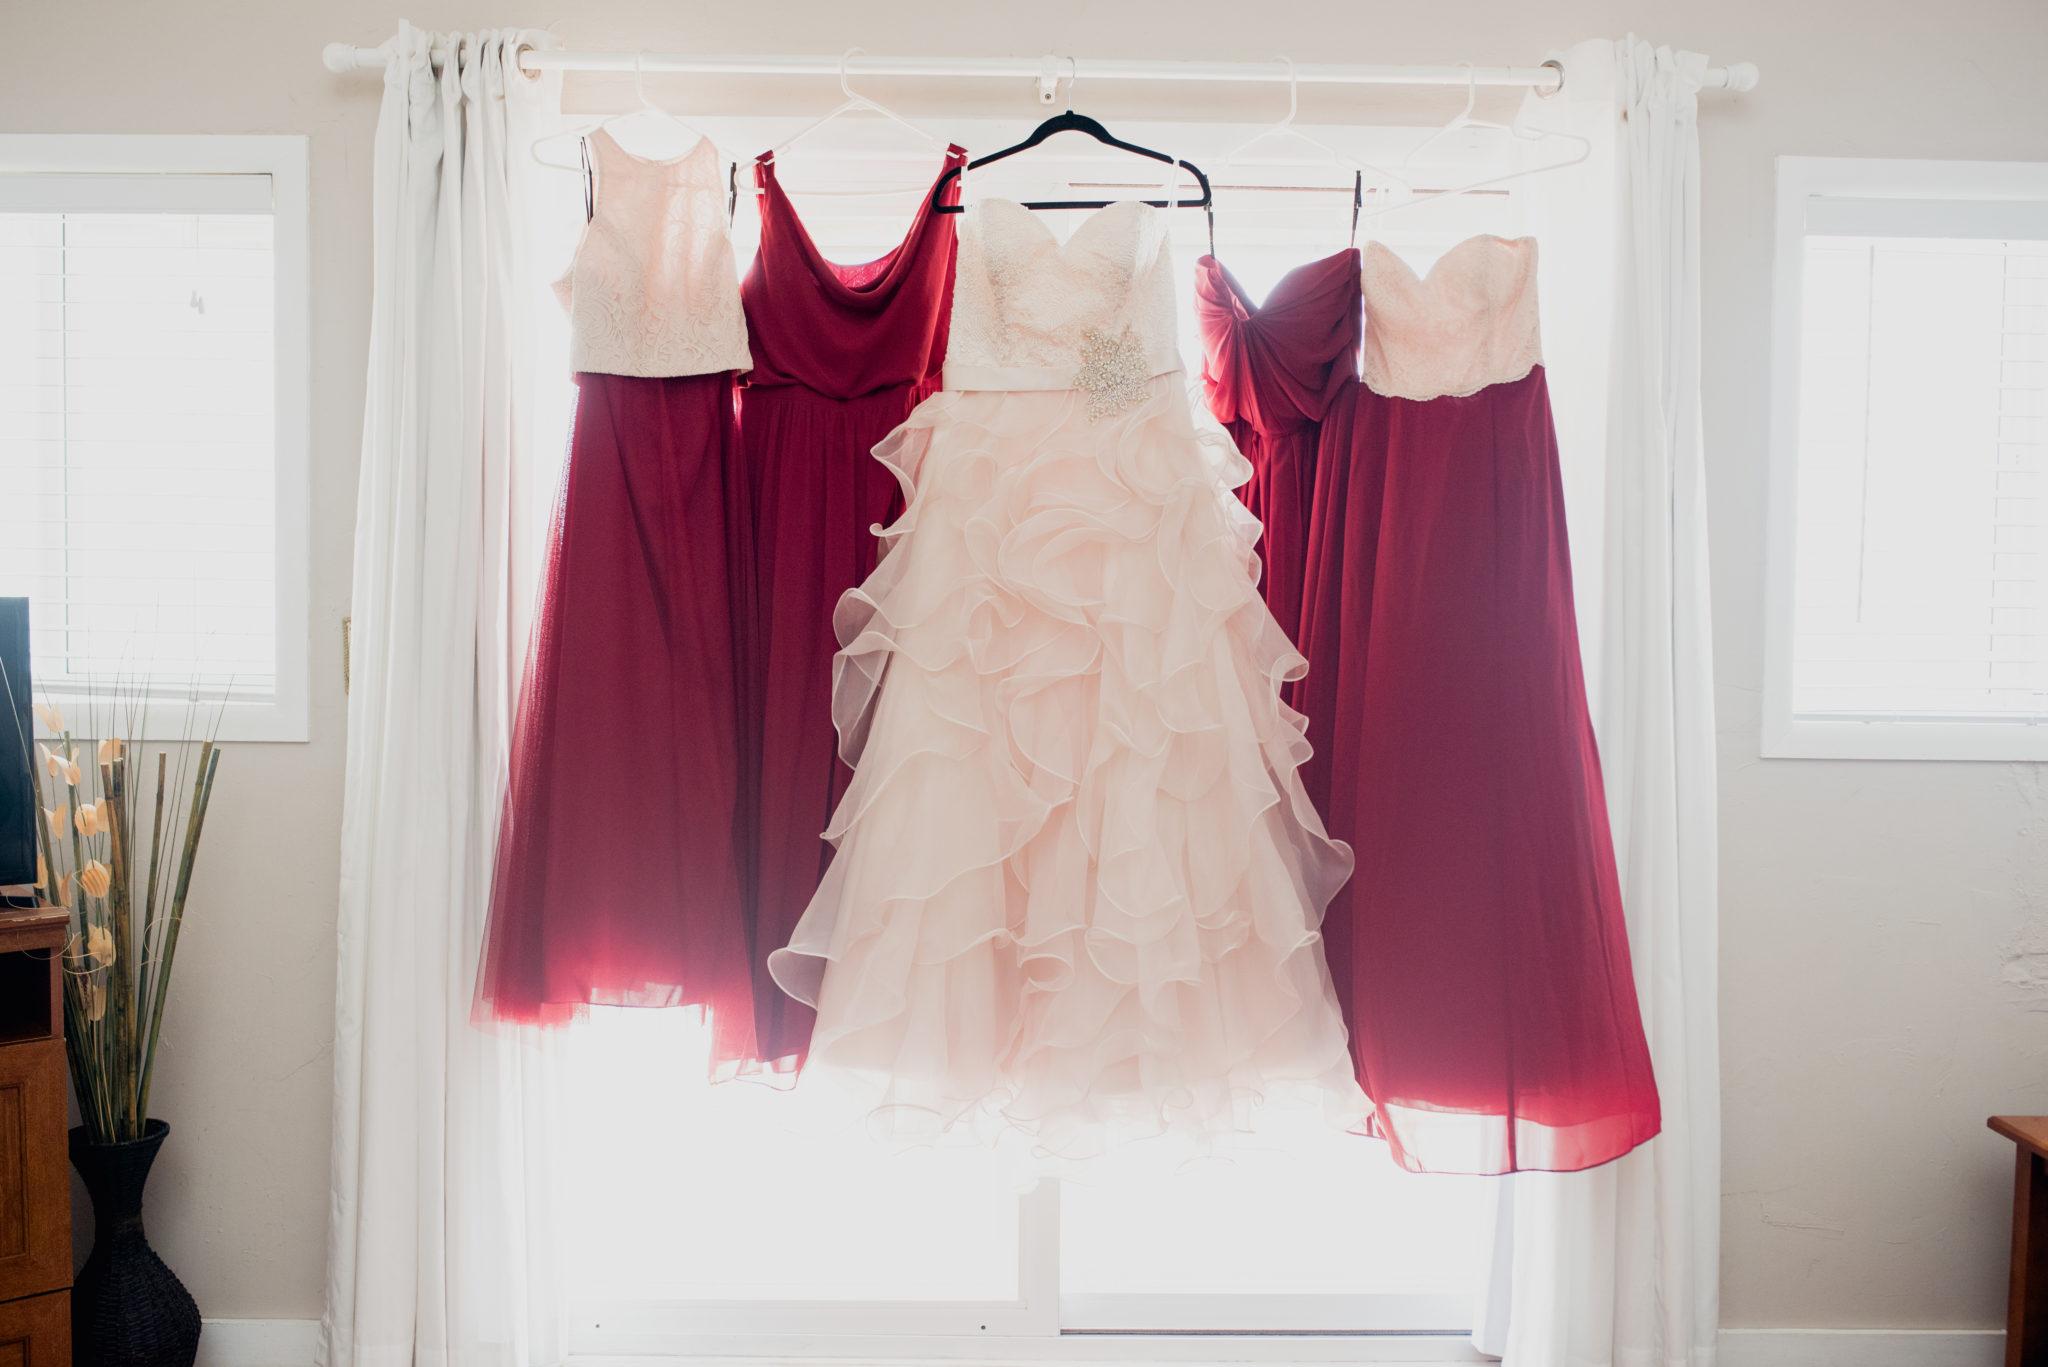 bridesmaids-dresses-hanging-in-window